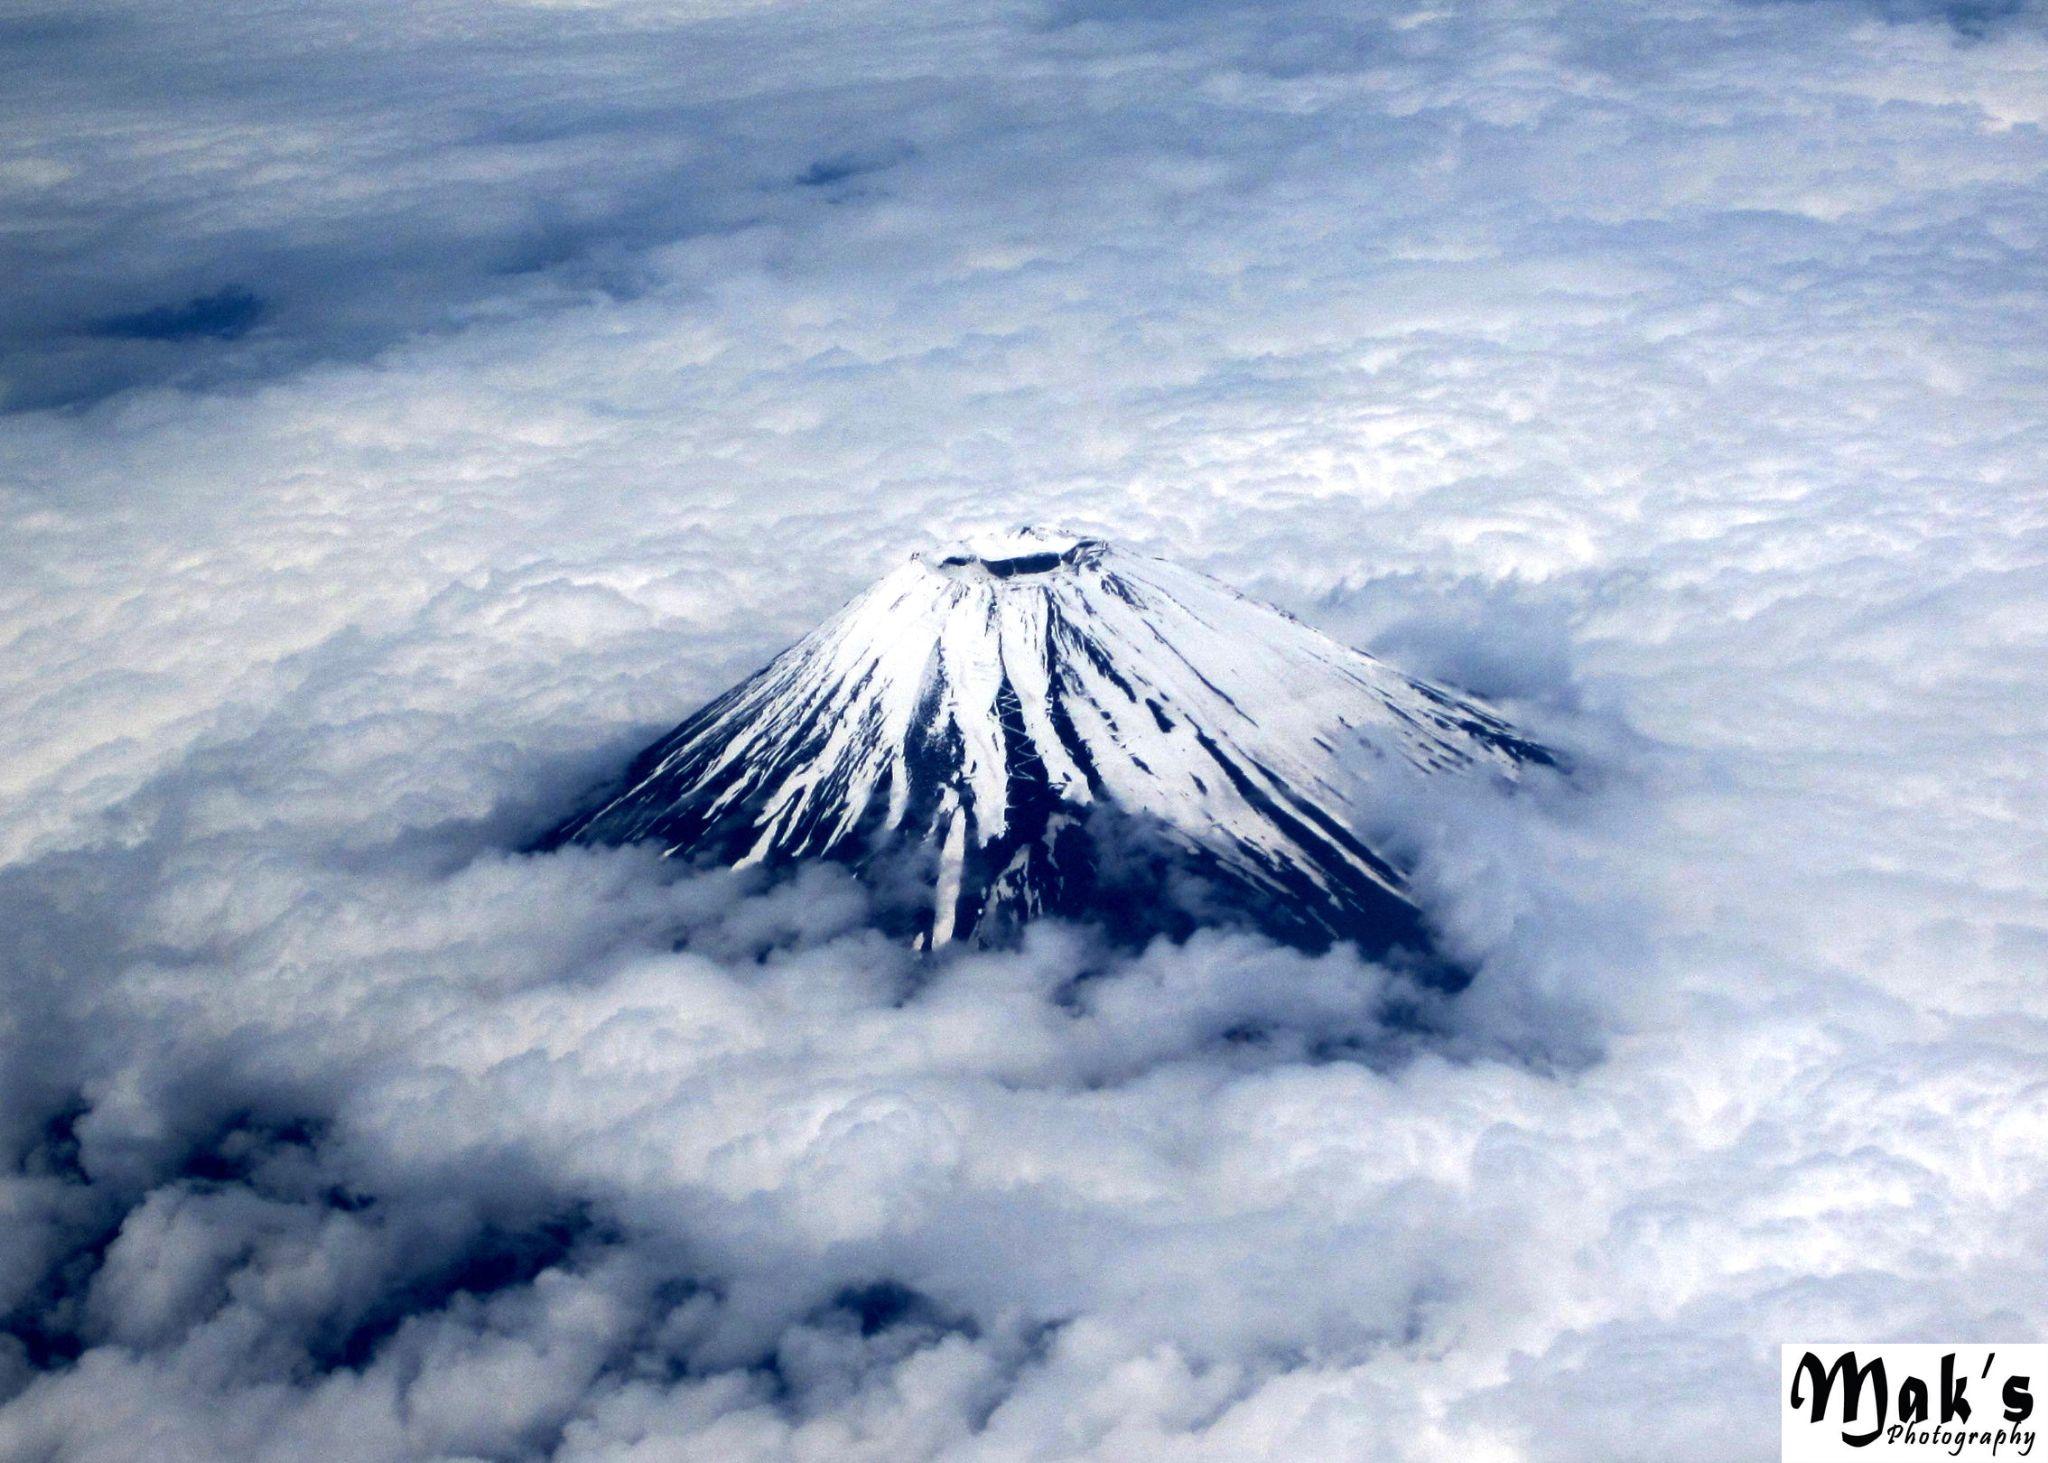 Mount Fuji (Fuji San), Japan by MAK Azad, Ph.D